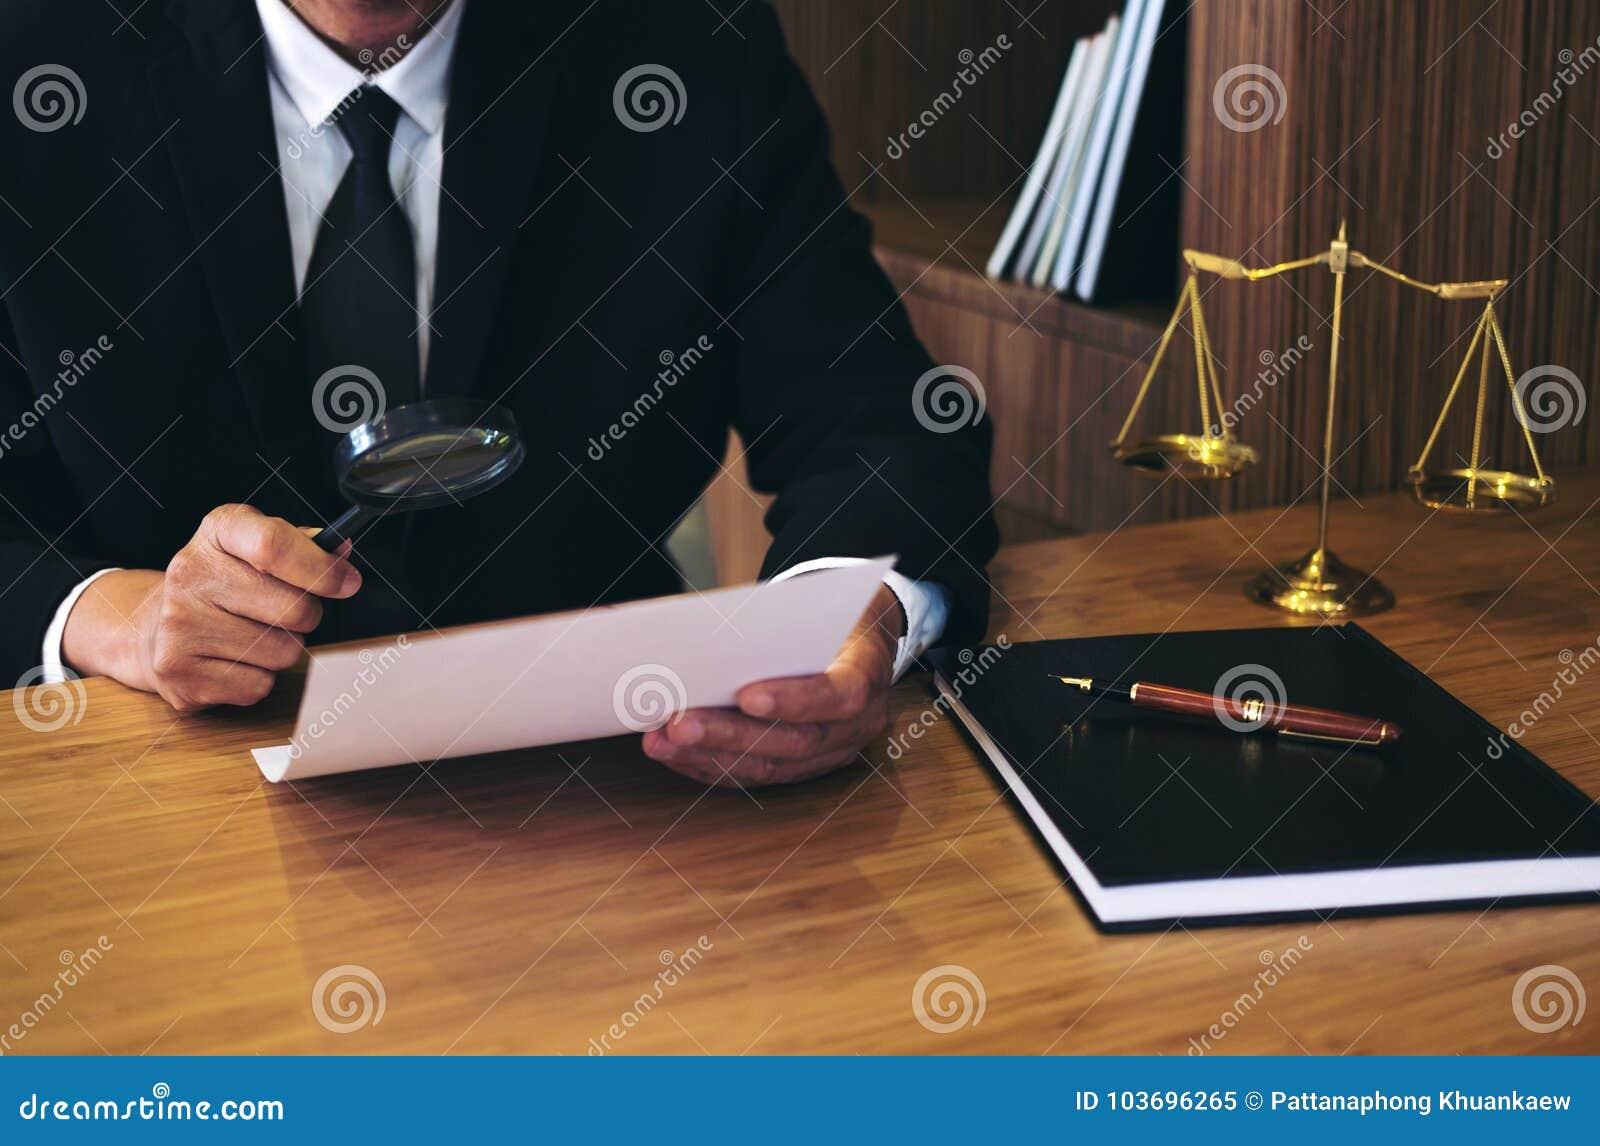 Document juridique de lecture d accord contractuel et d examen d avocat masculin